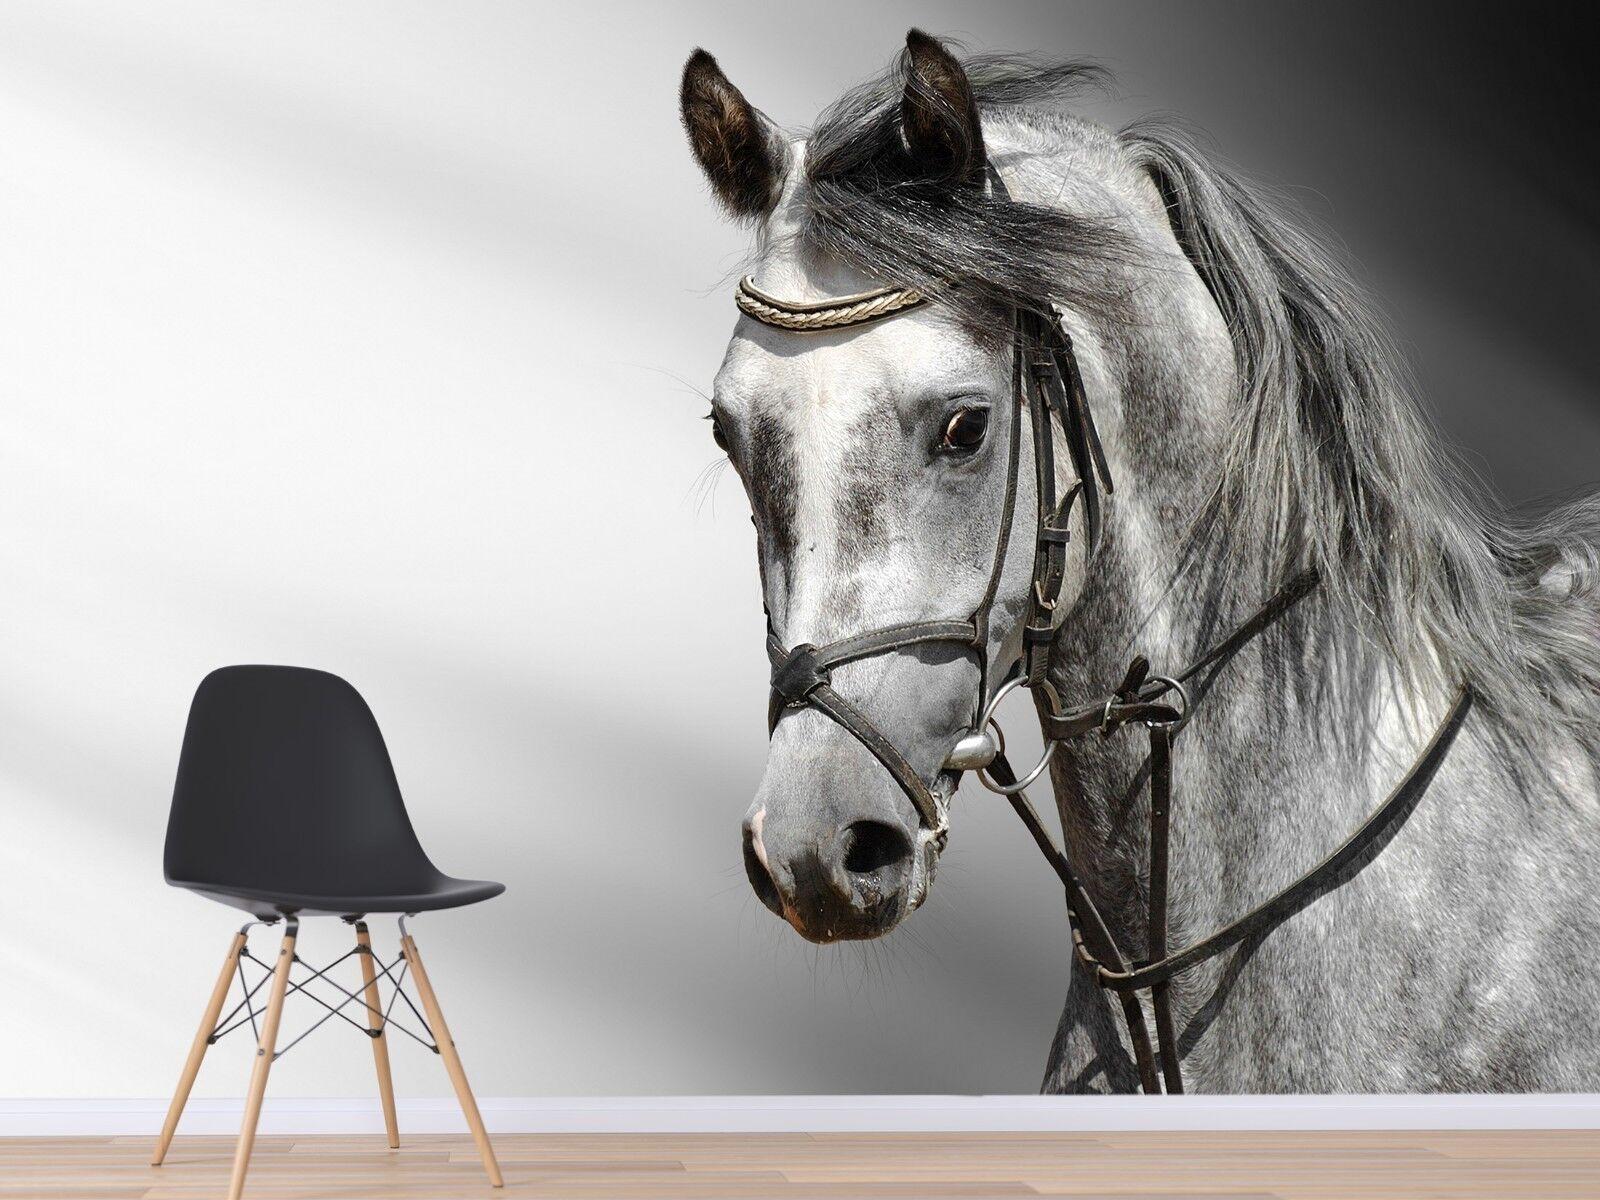 3D Sketch Animal Horse 225 Wallpaper Mural Wallpaper UK Jenny